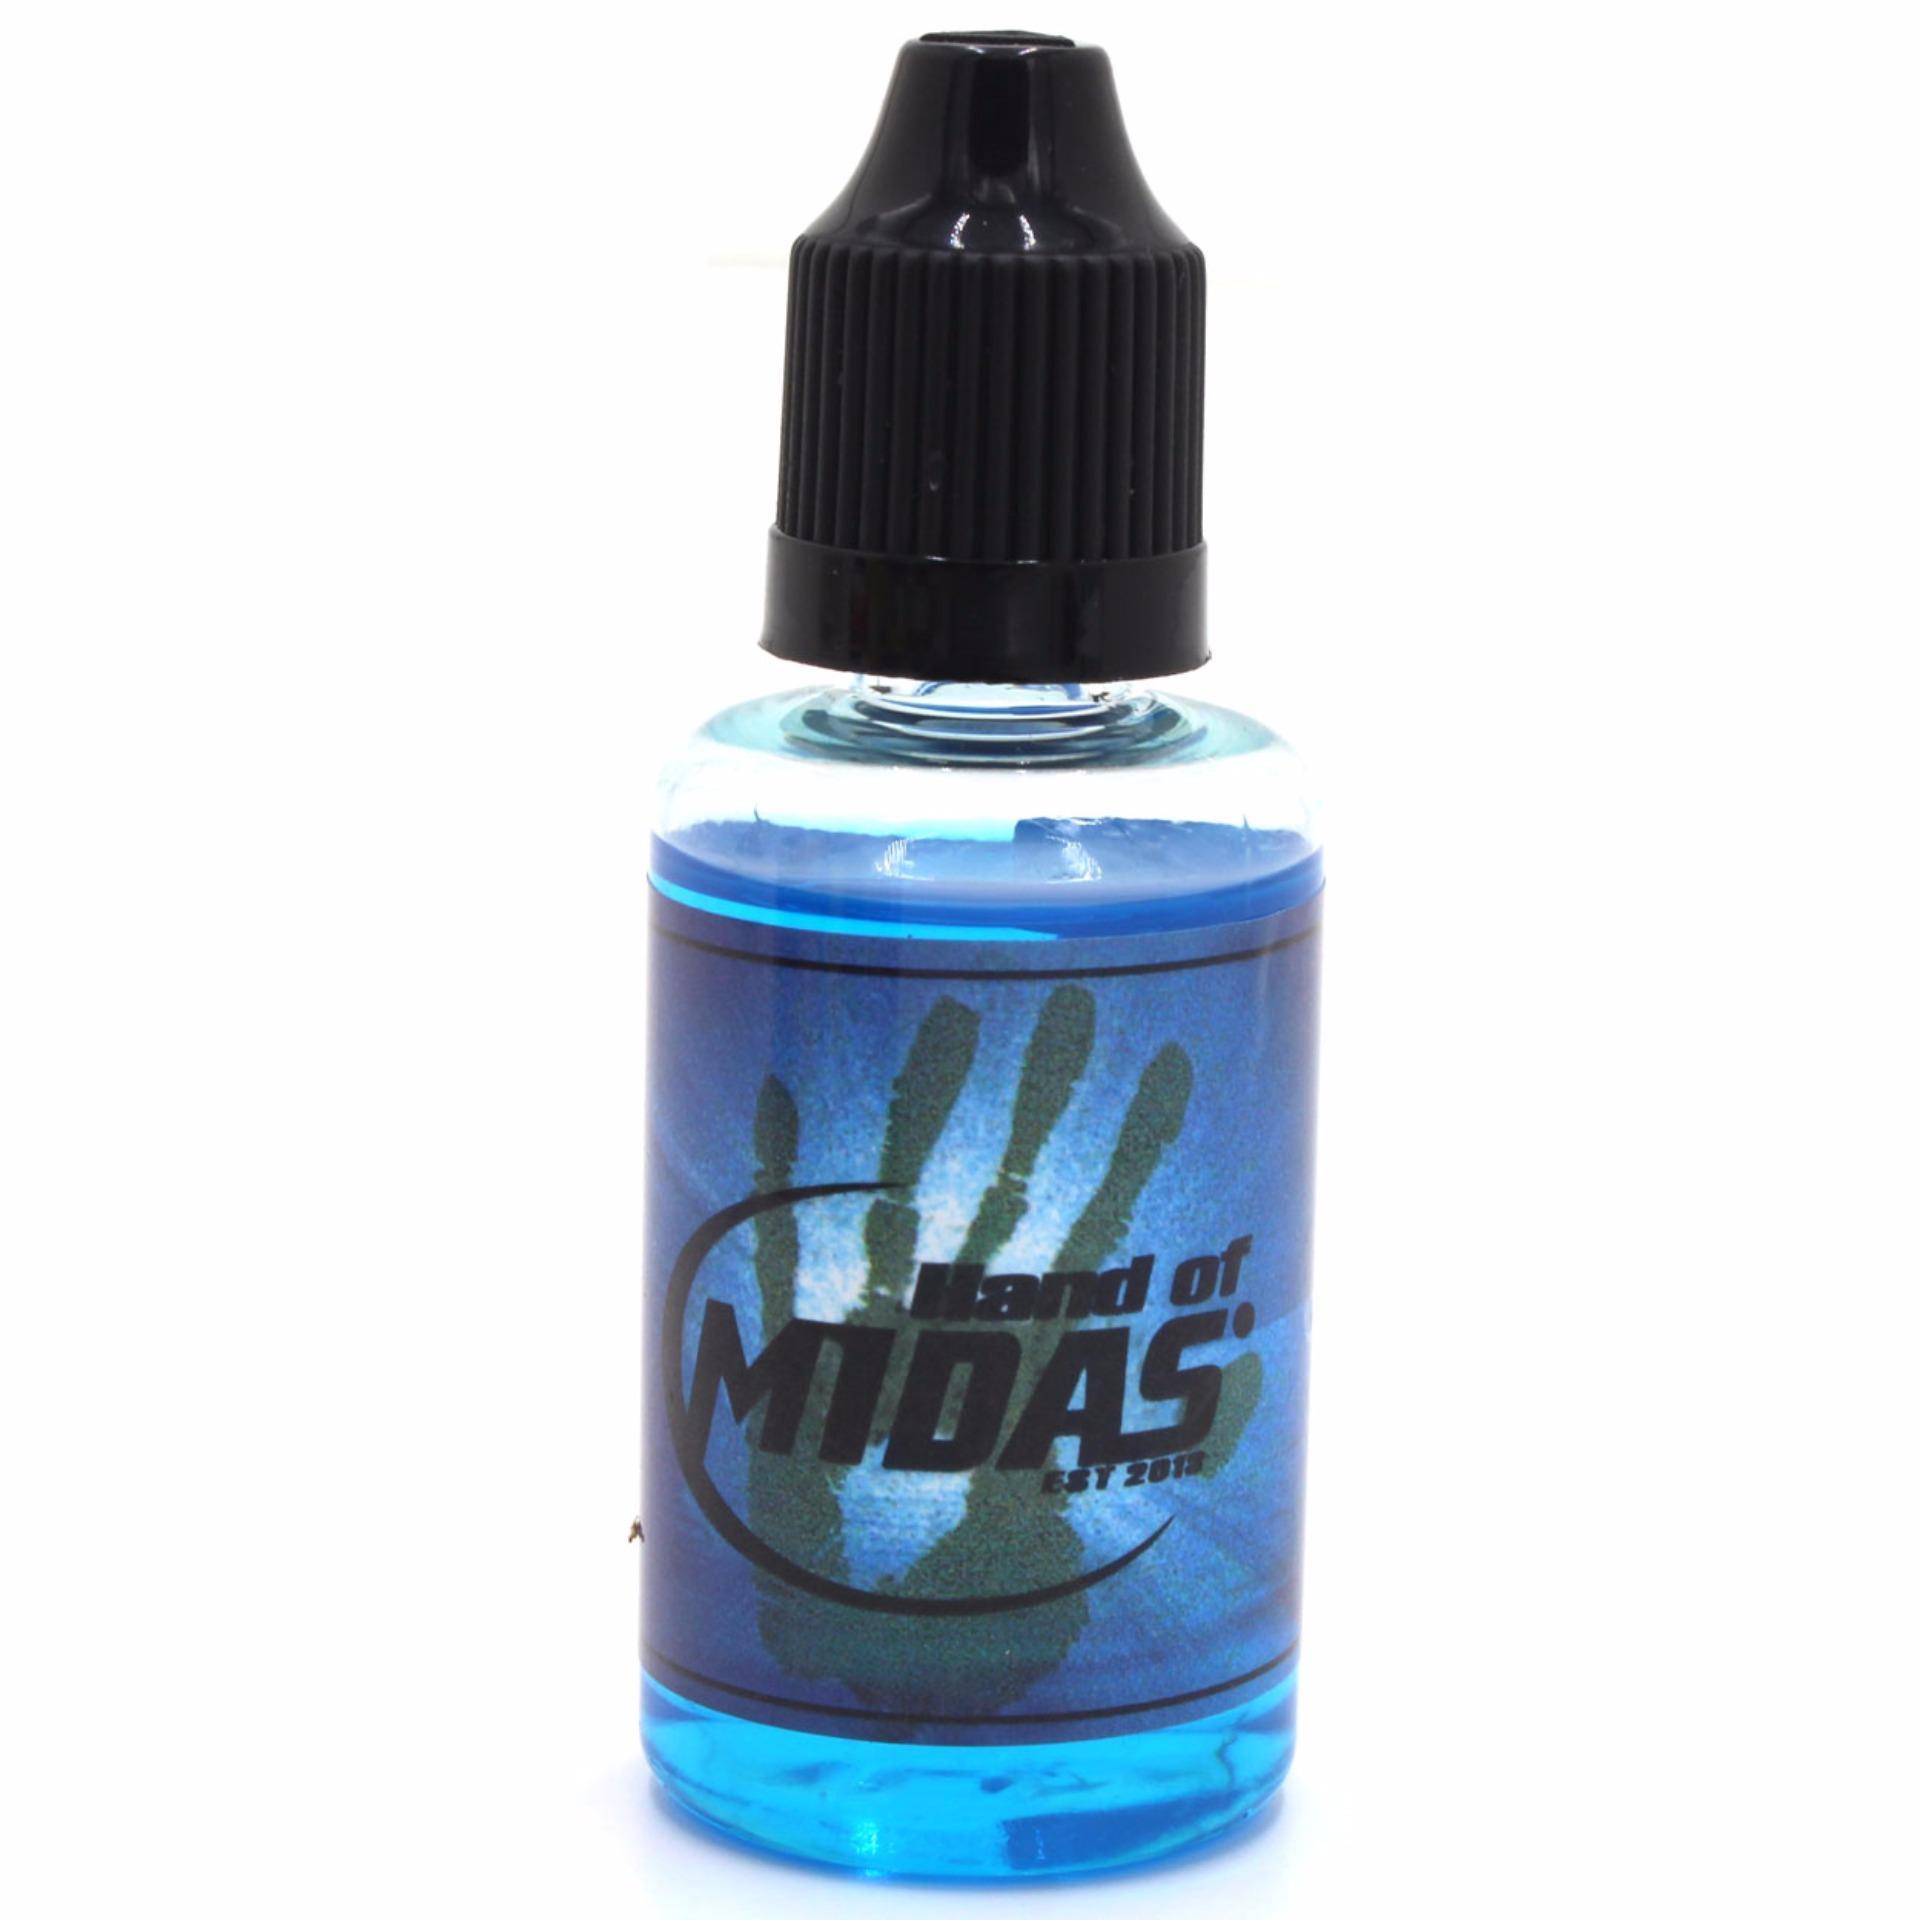 Malaysian 30ml Premium Vapor E-Juice for Electronic Cigarette Setof 5 (